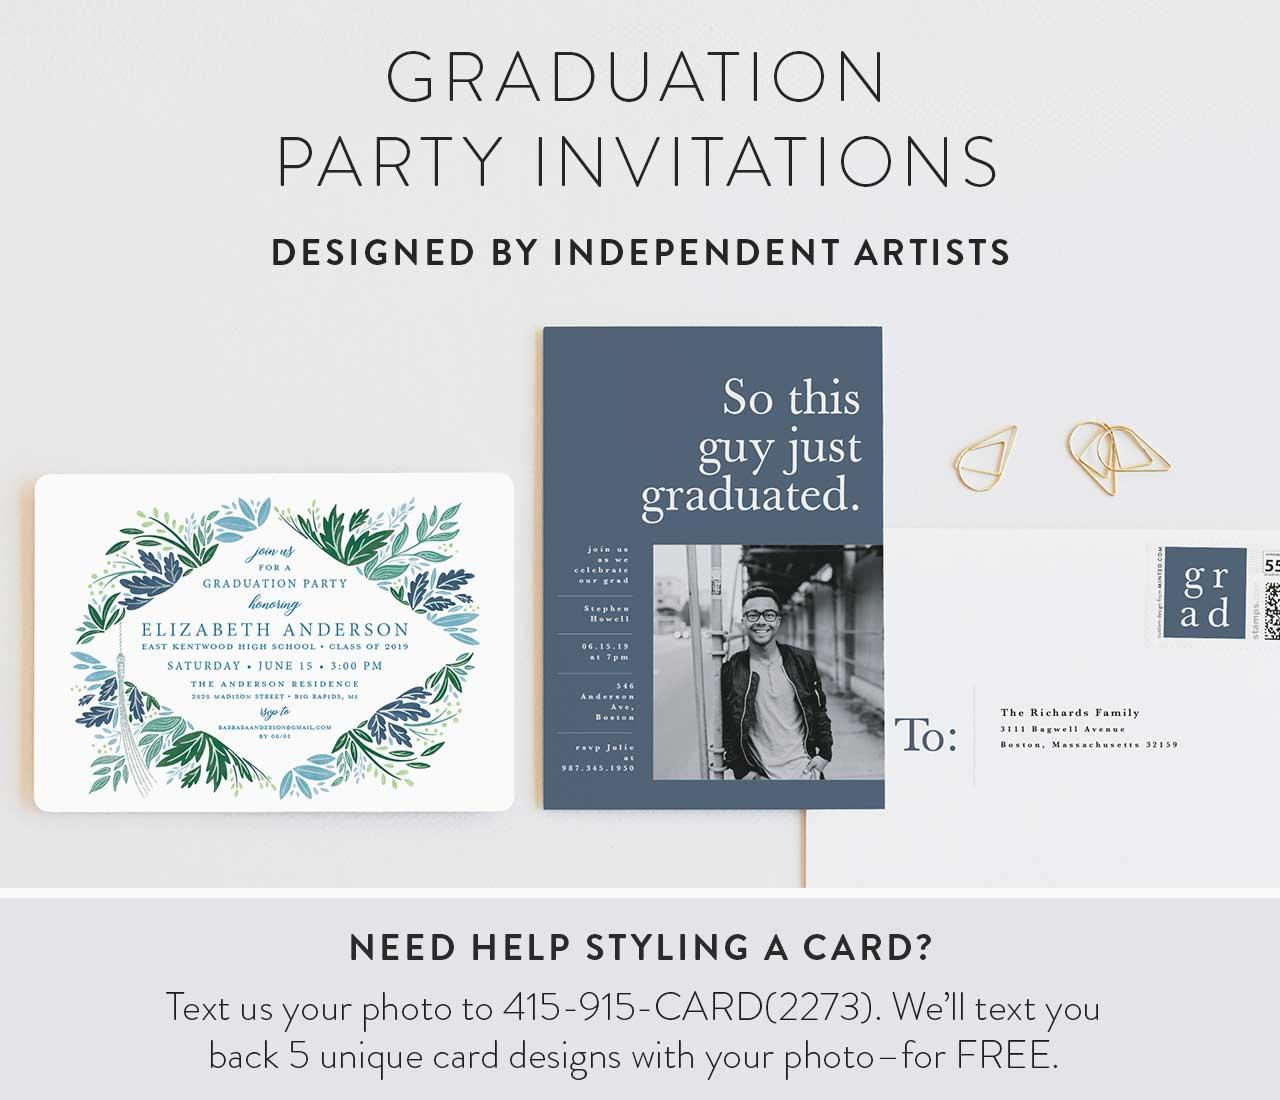 Graduation Party Invitations